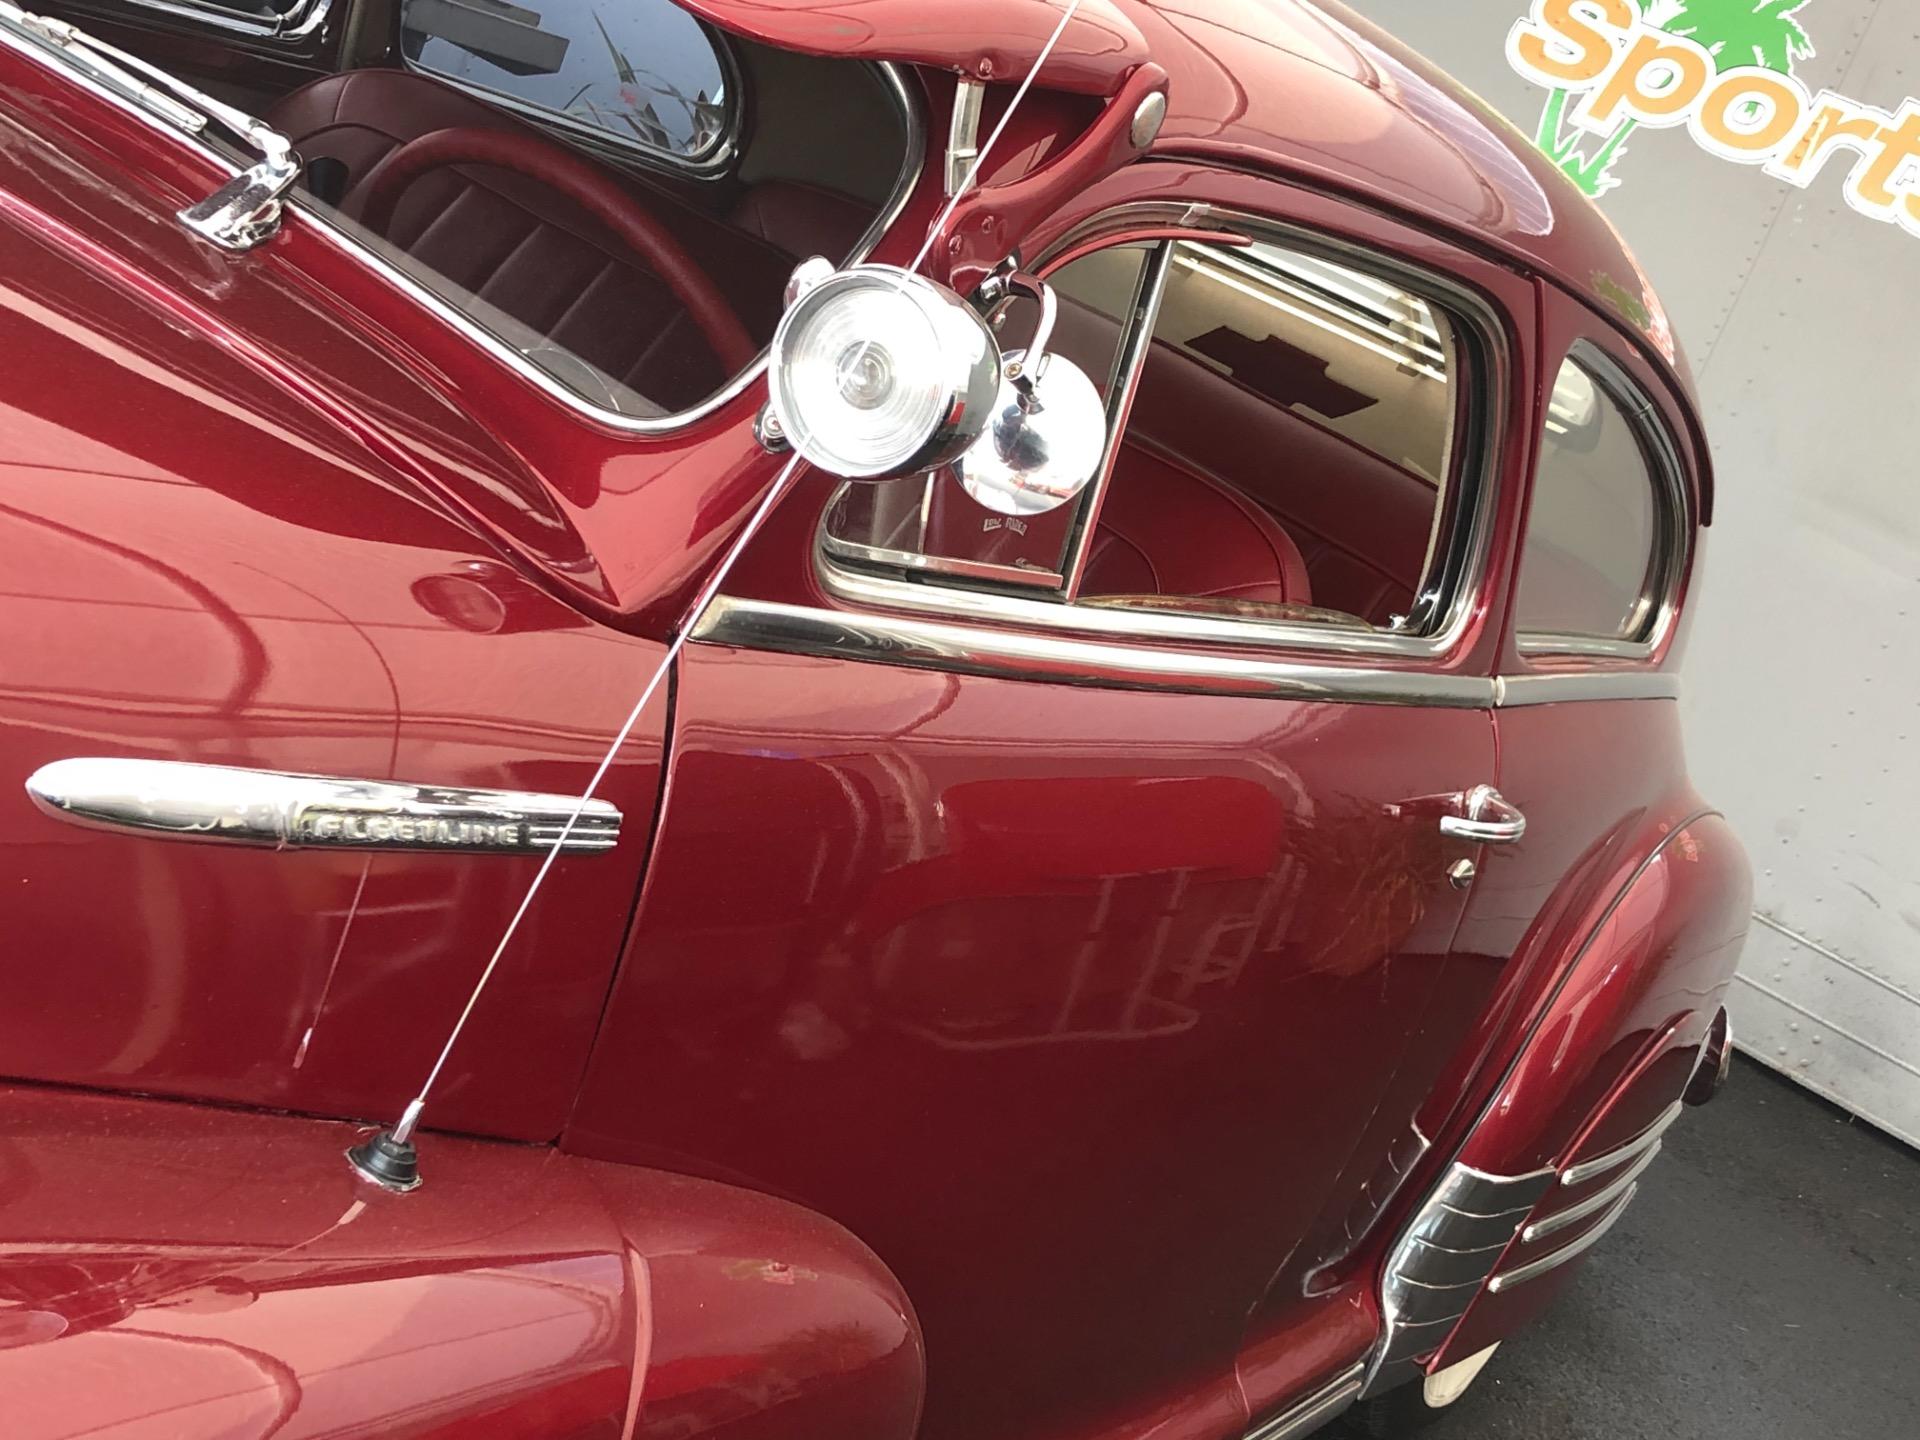 Used 1948 Chevrolet Fleetline